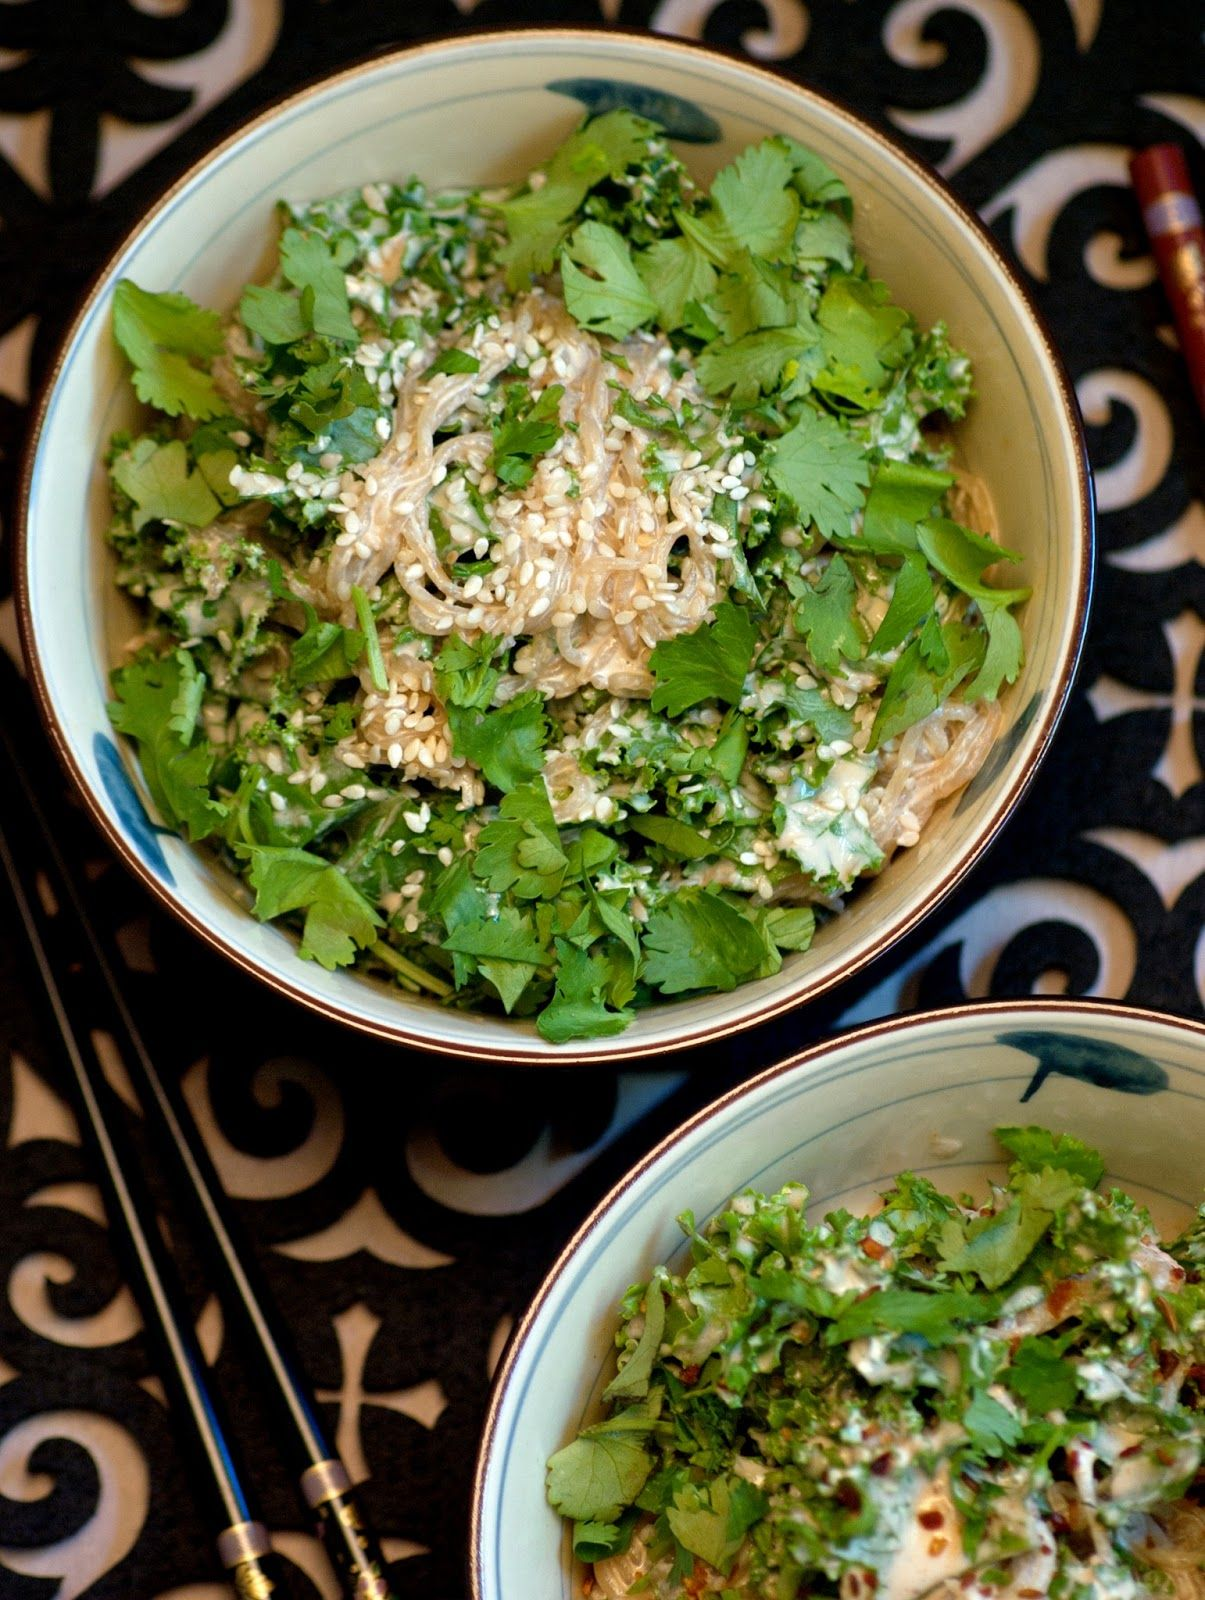 'Creamy' Asian Noodle Kale Salad. Almost Skinny Vegan Food